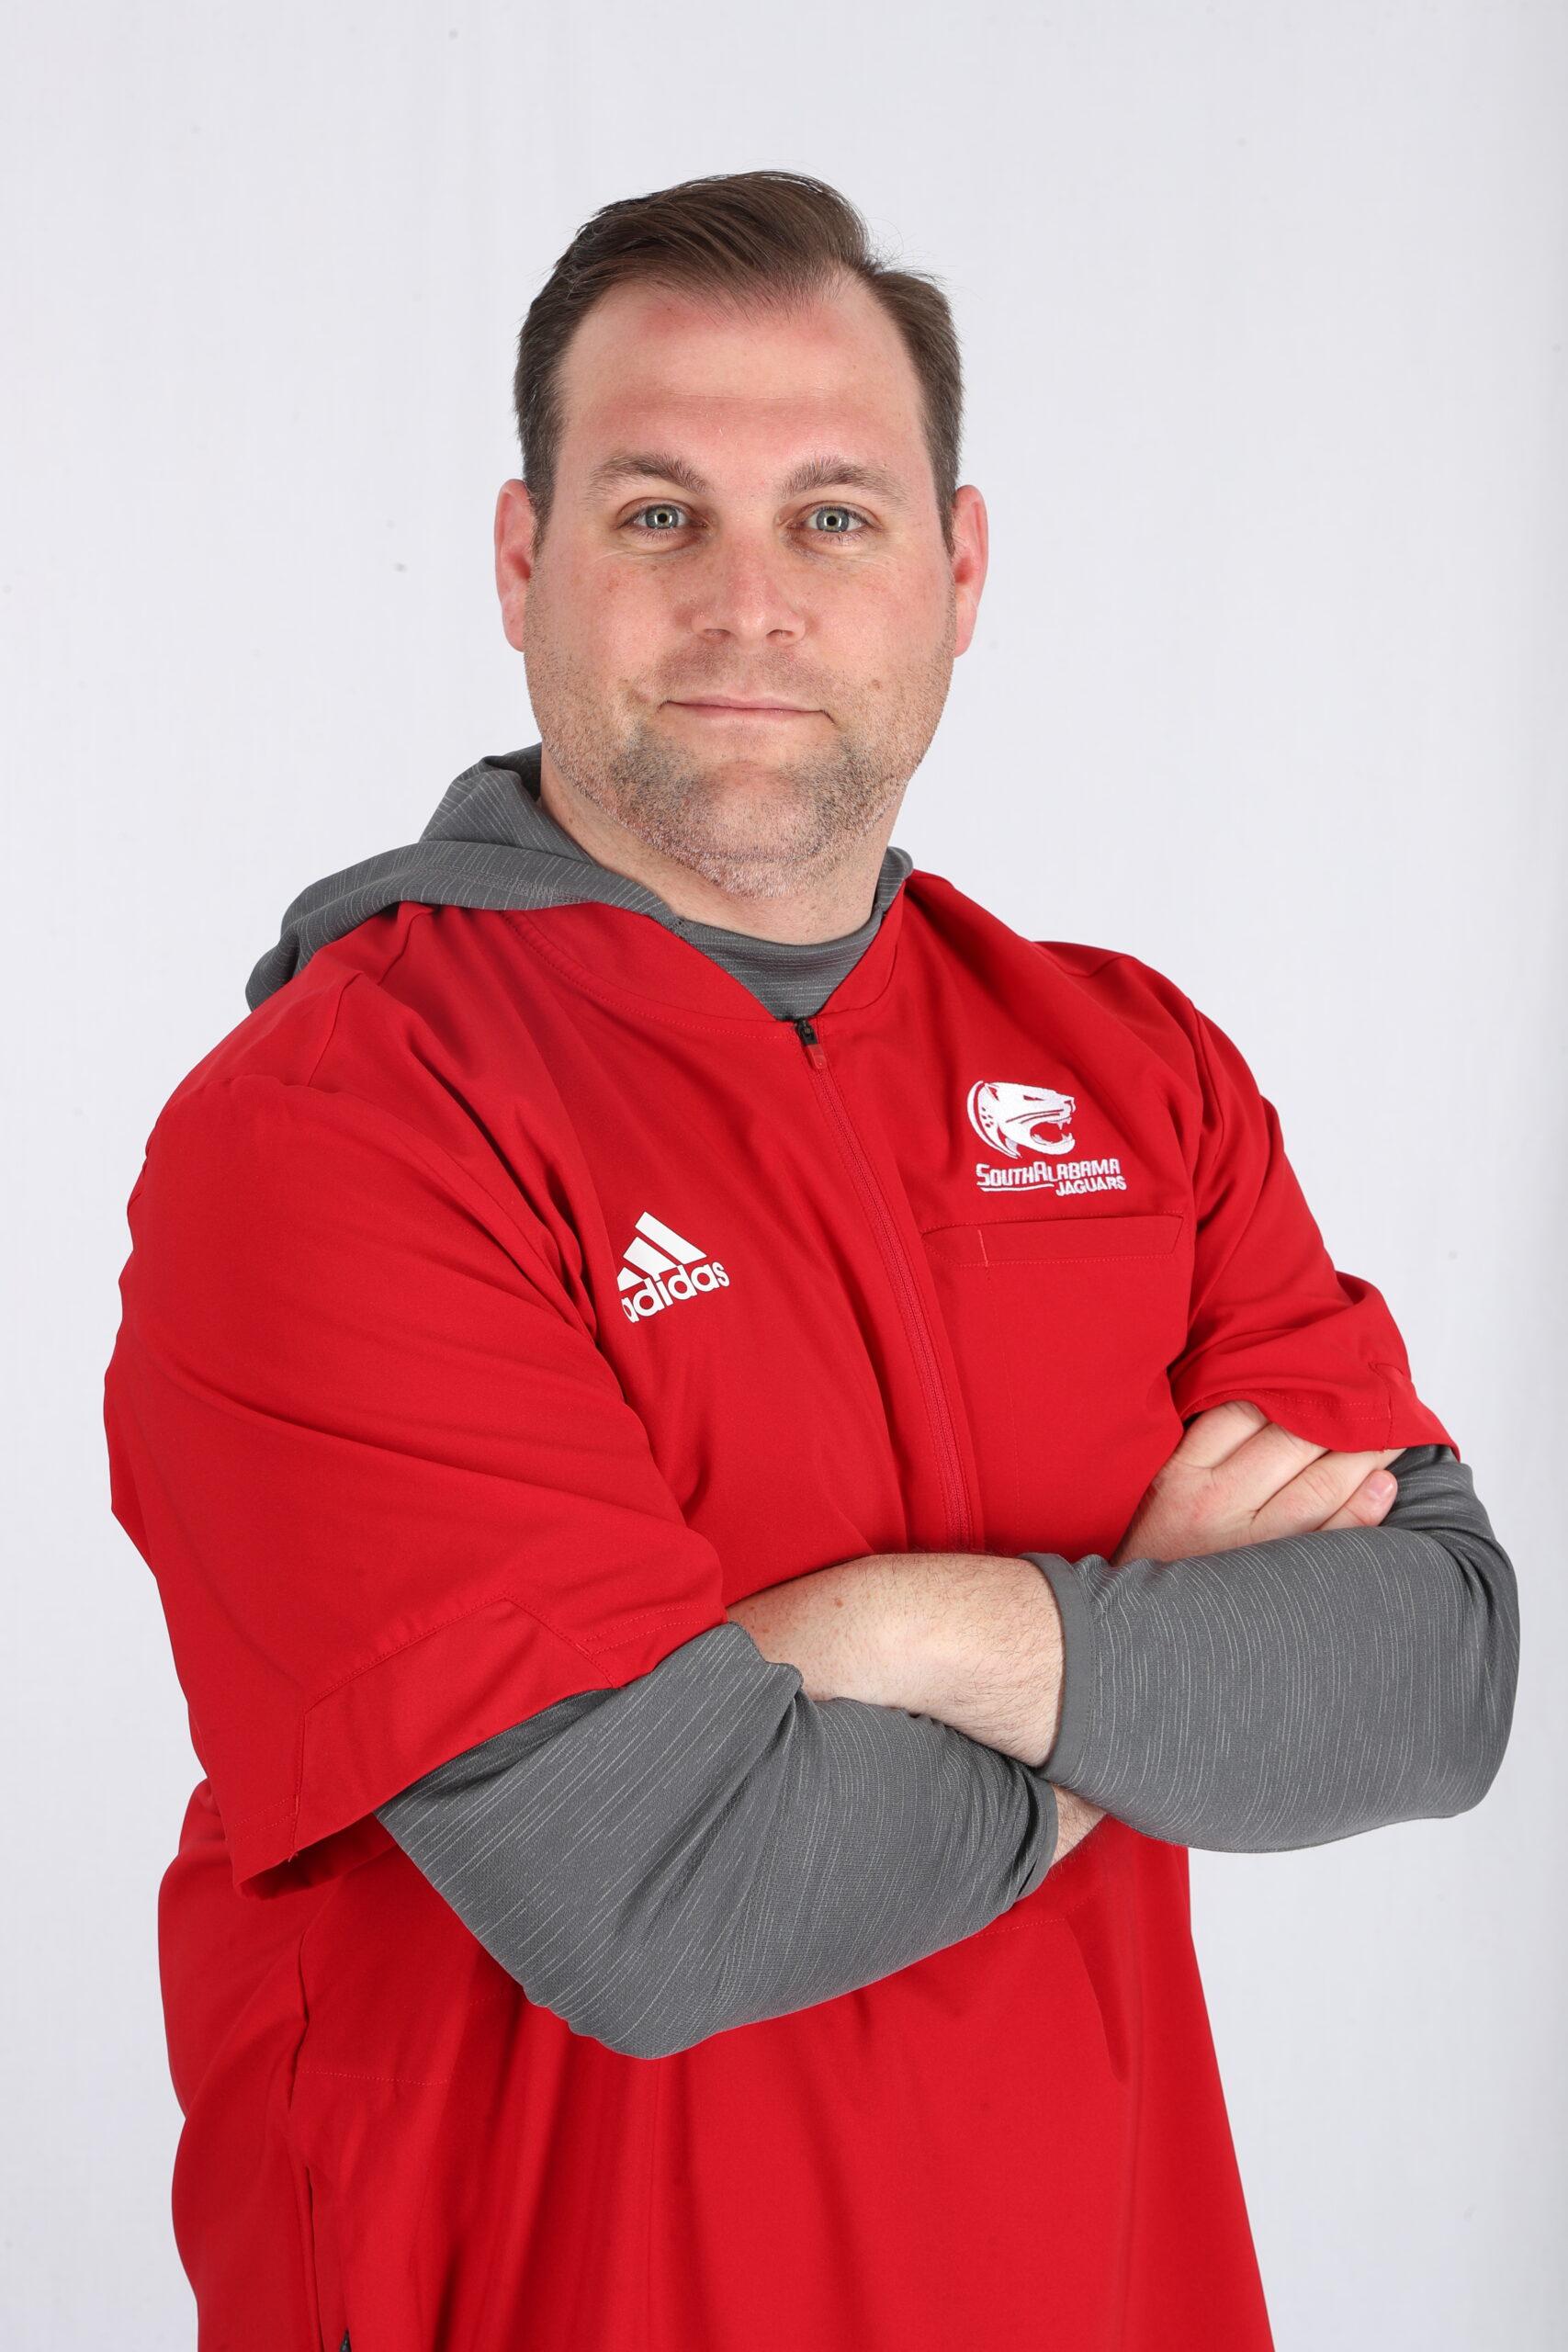 USA Football Head Coach